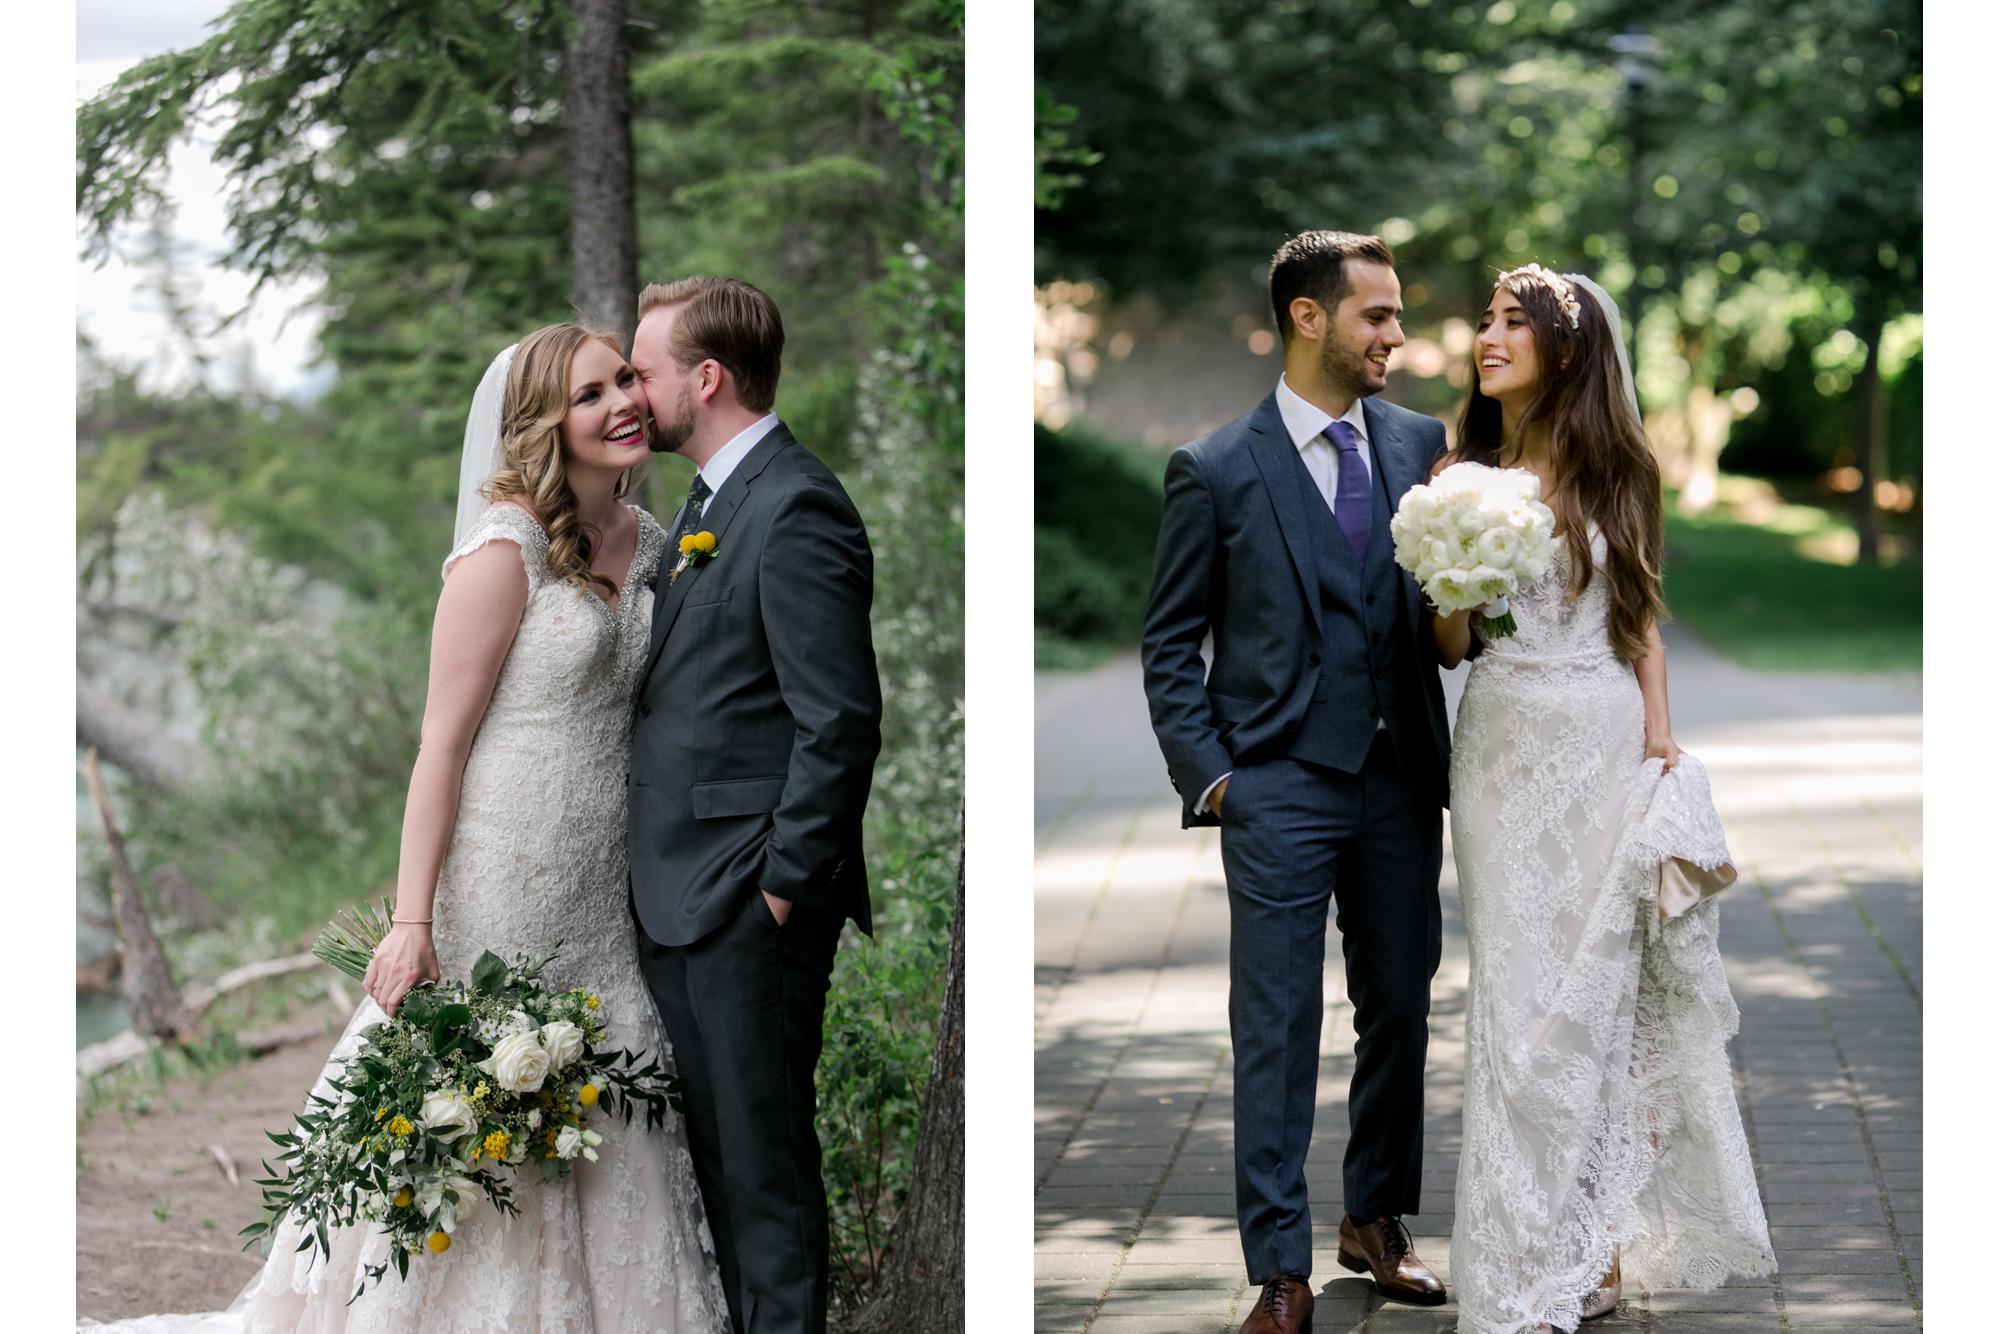 vancouver-luxury-wedding-photographer-lori-miles-18.jpg